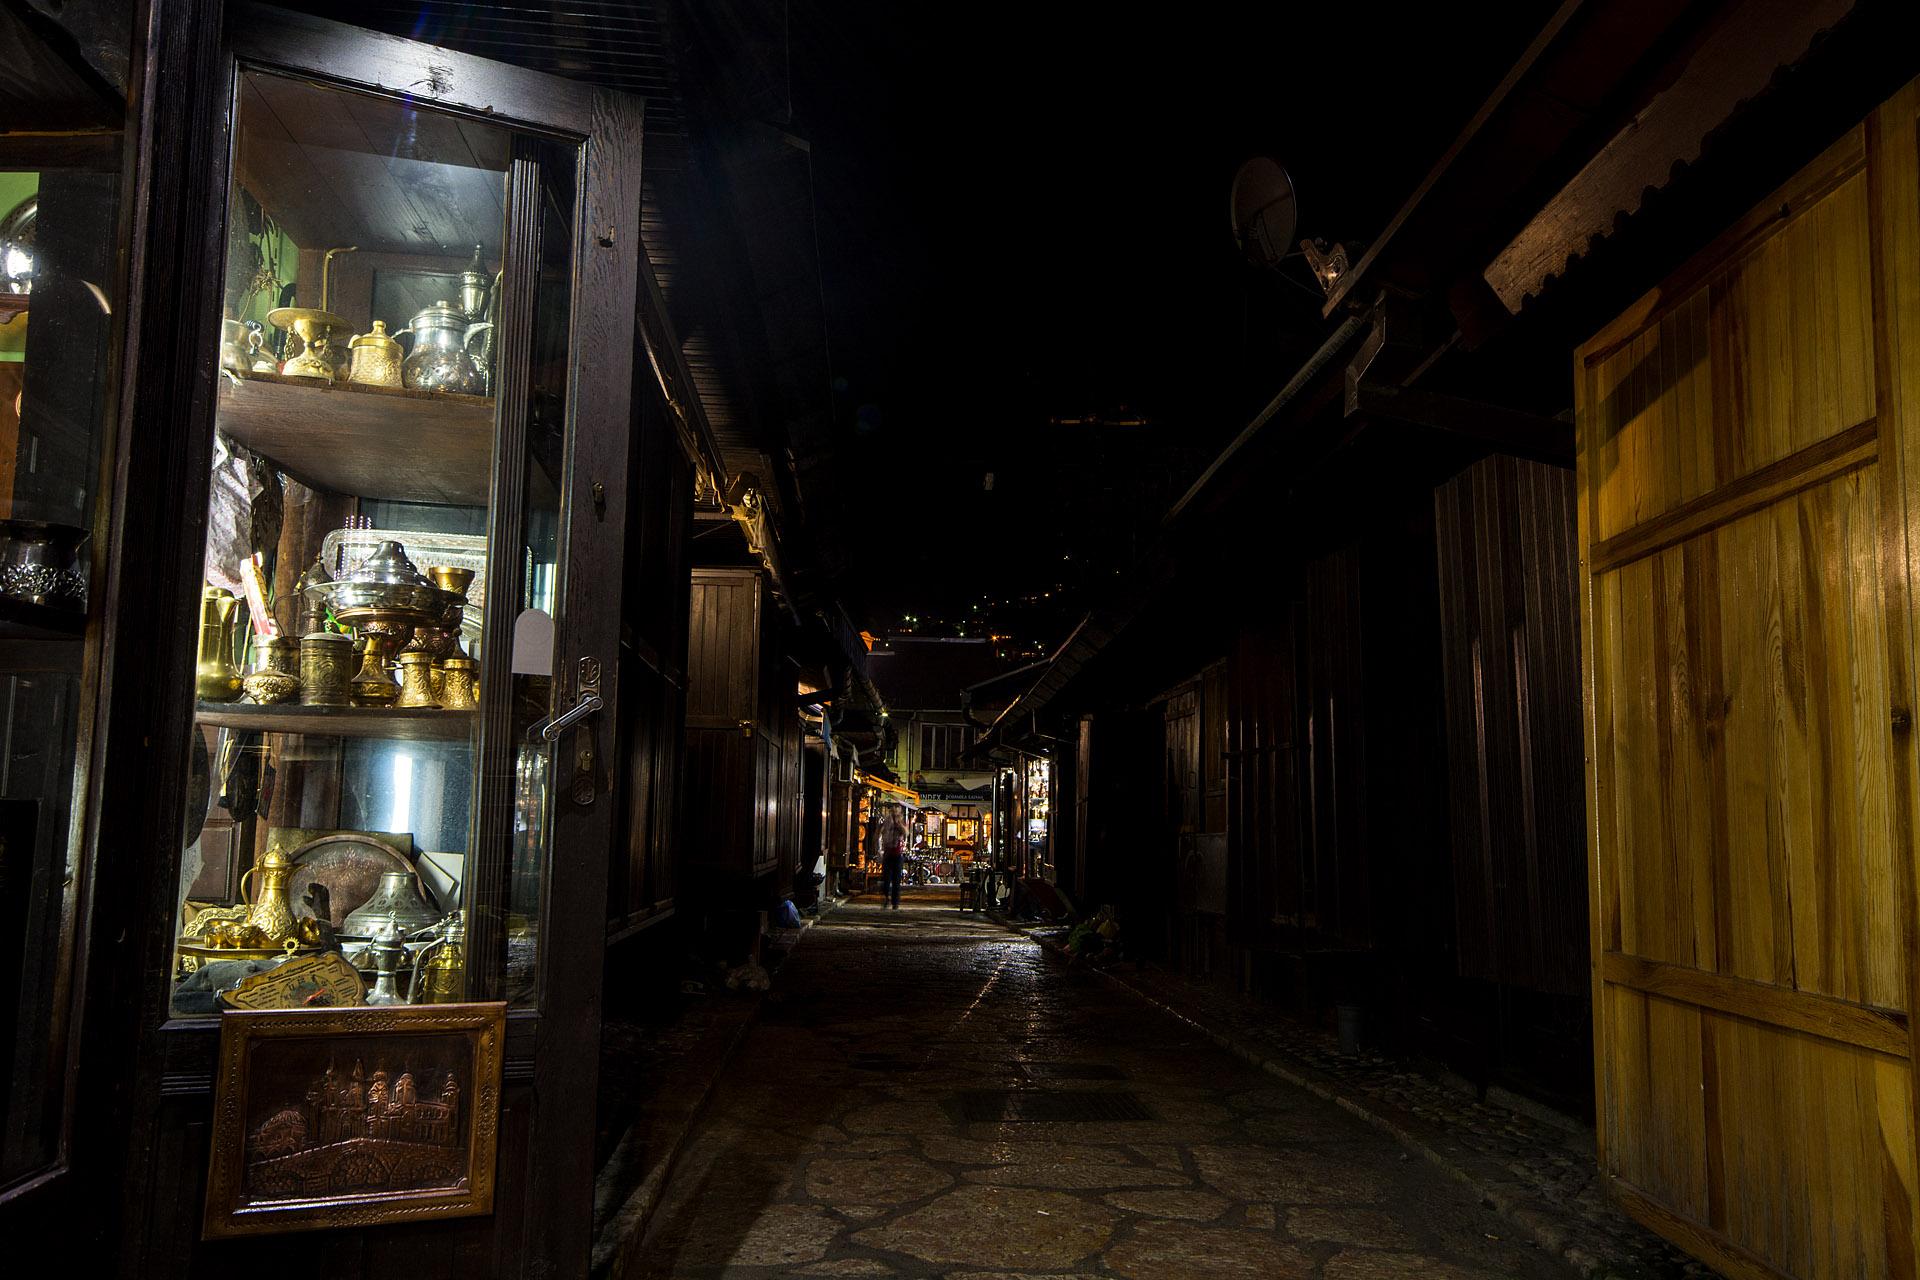 Bascarsija at night